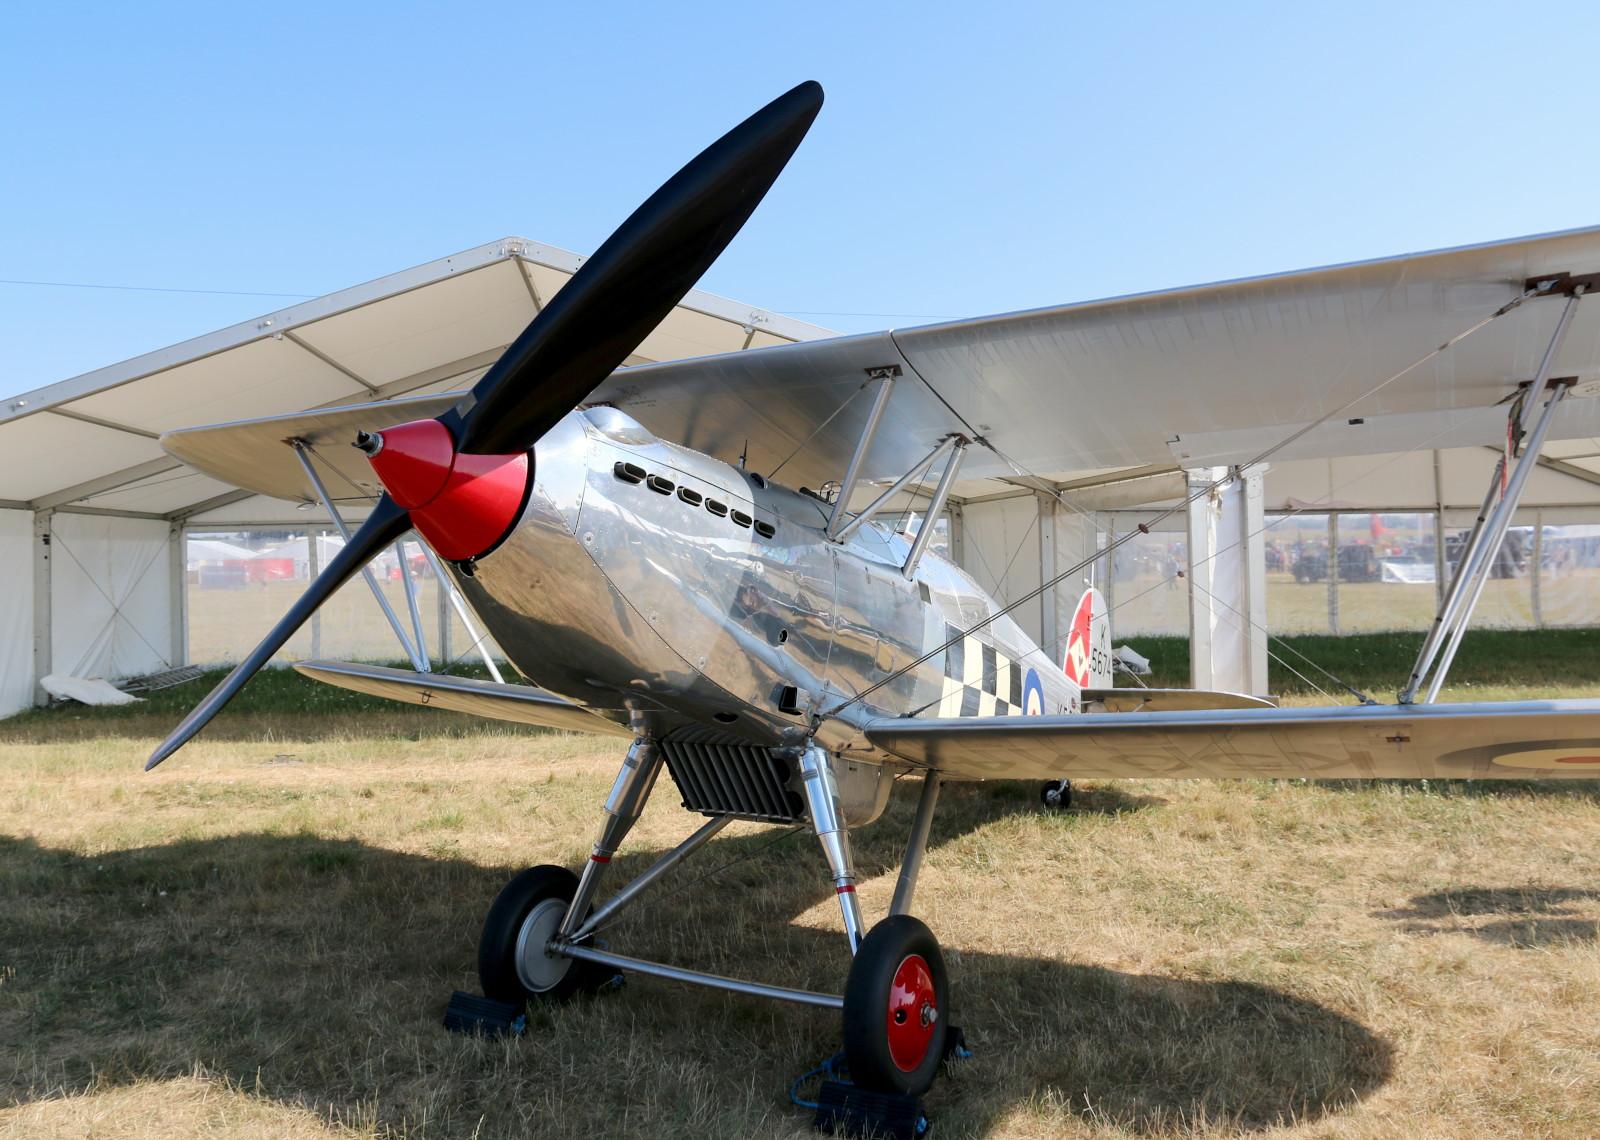 Hawker Fury K5674 © Doppeladler.com